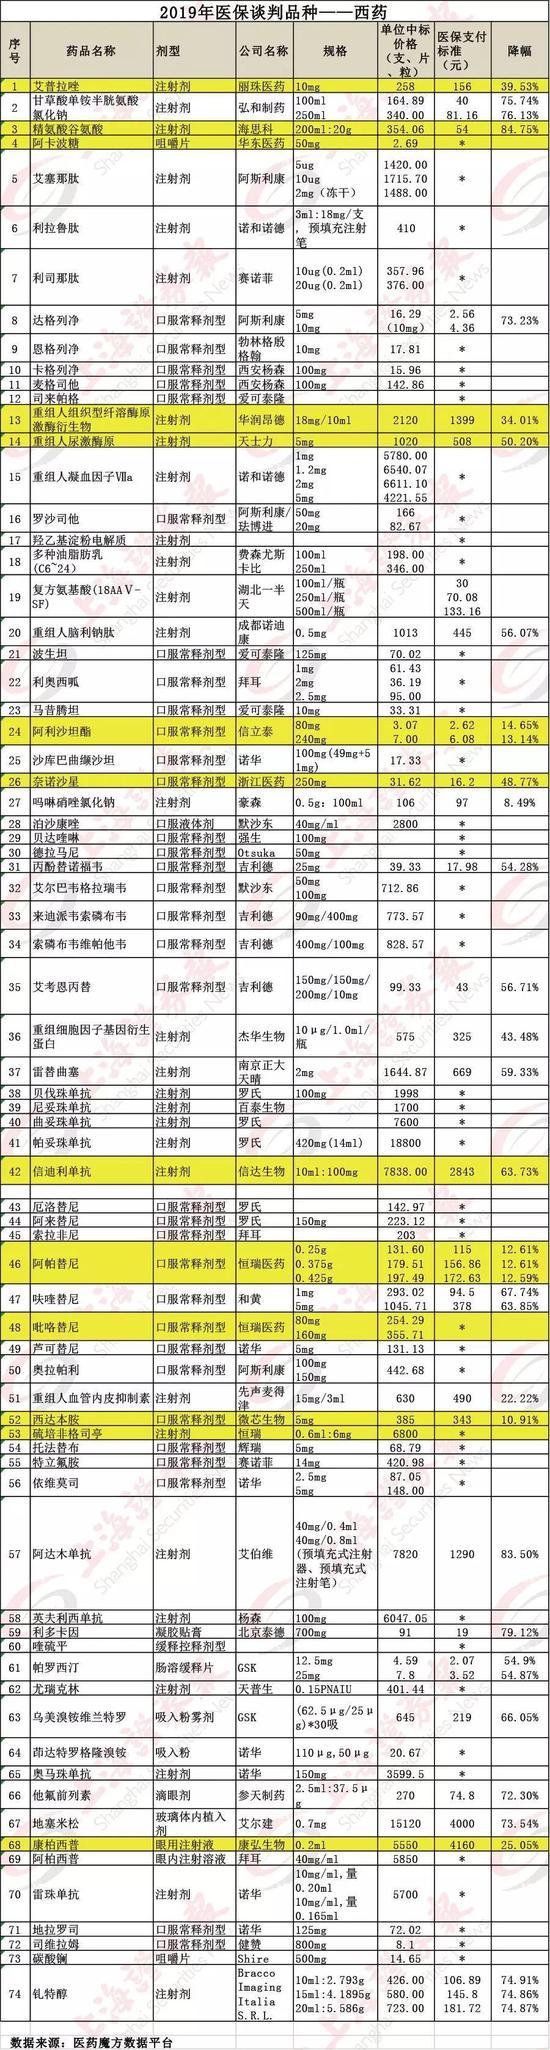 lg游戏平台有哪些网站,两江新区锦橙路开来一辆摩托车,后号牌竟是DIY